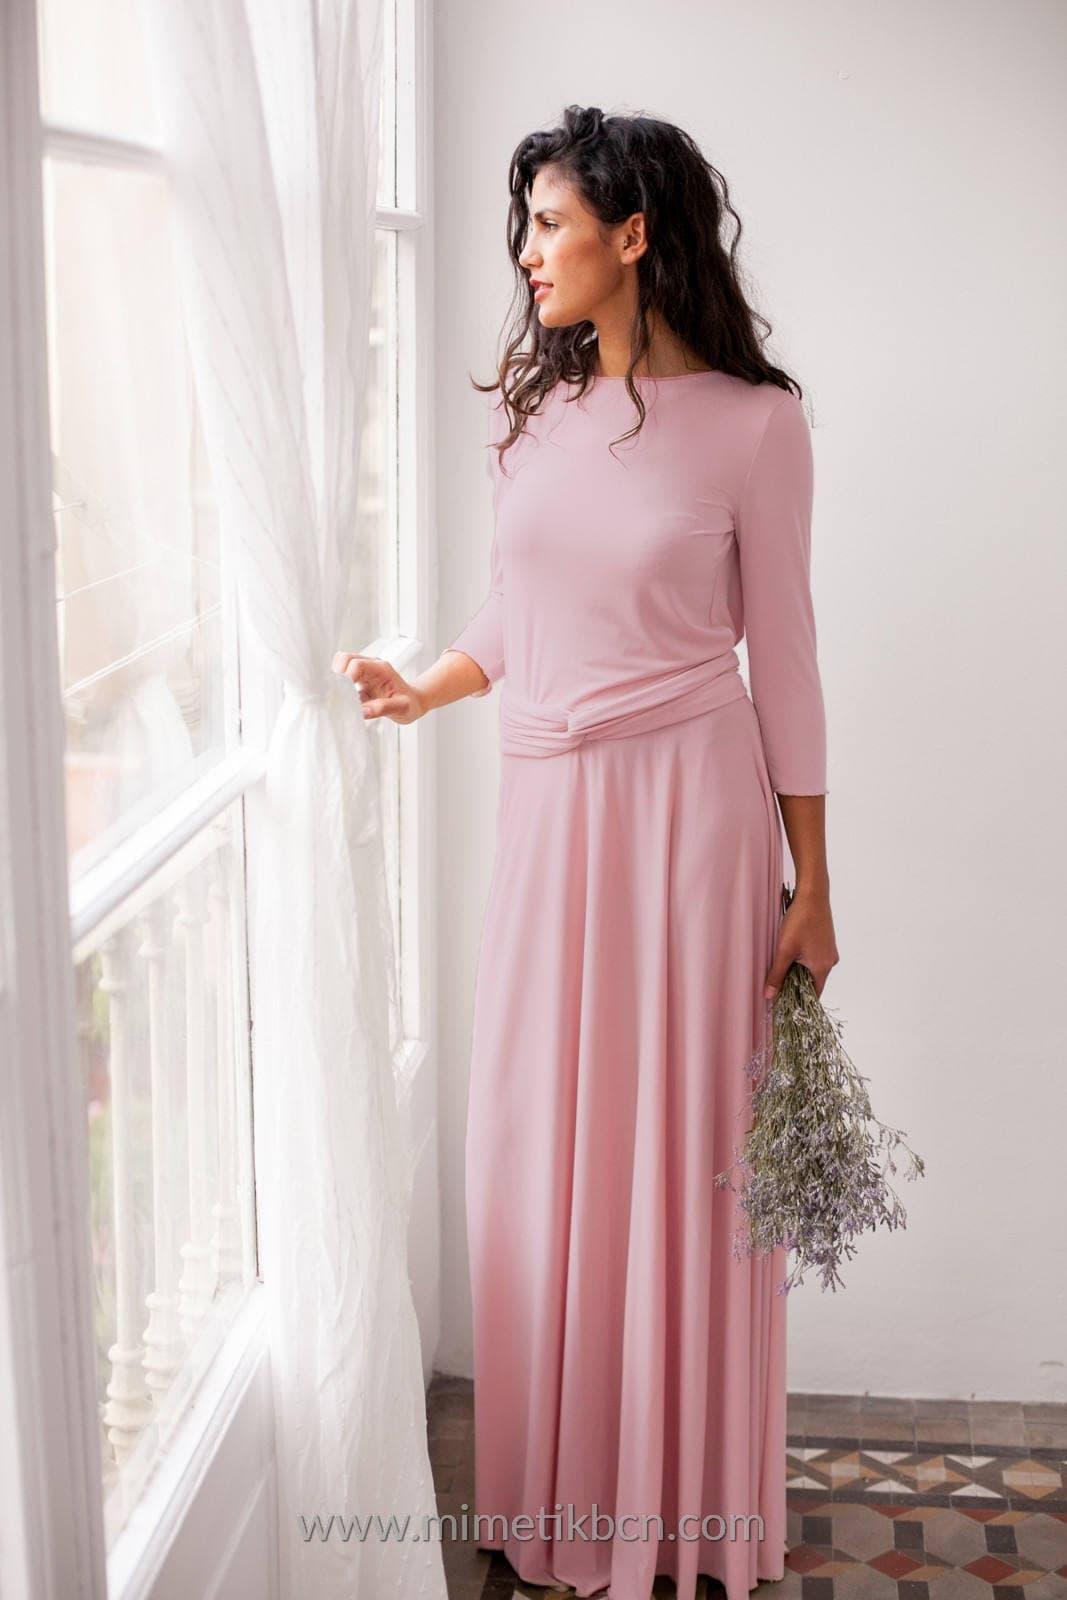 Vestido rosa palo con manga vestido con manga color rosa | Etsy